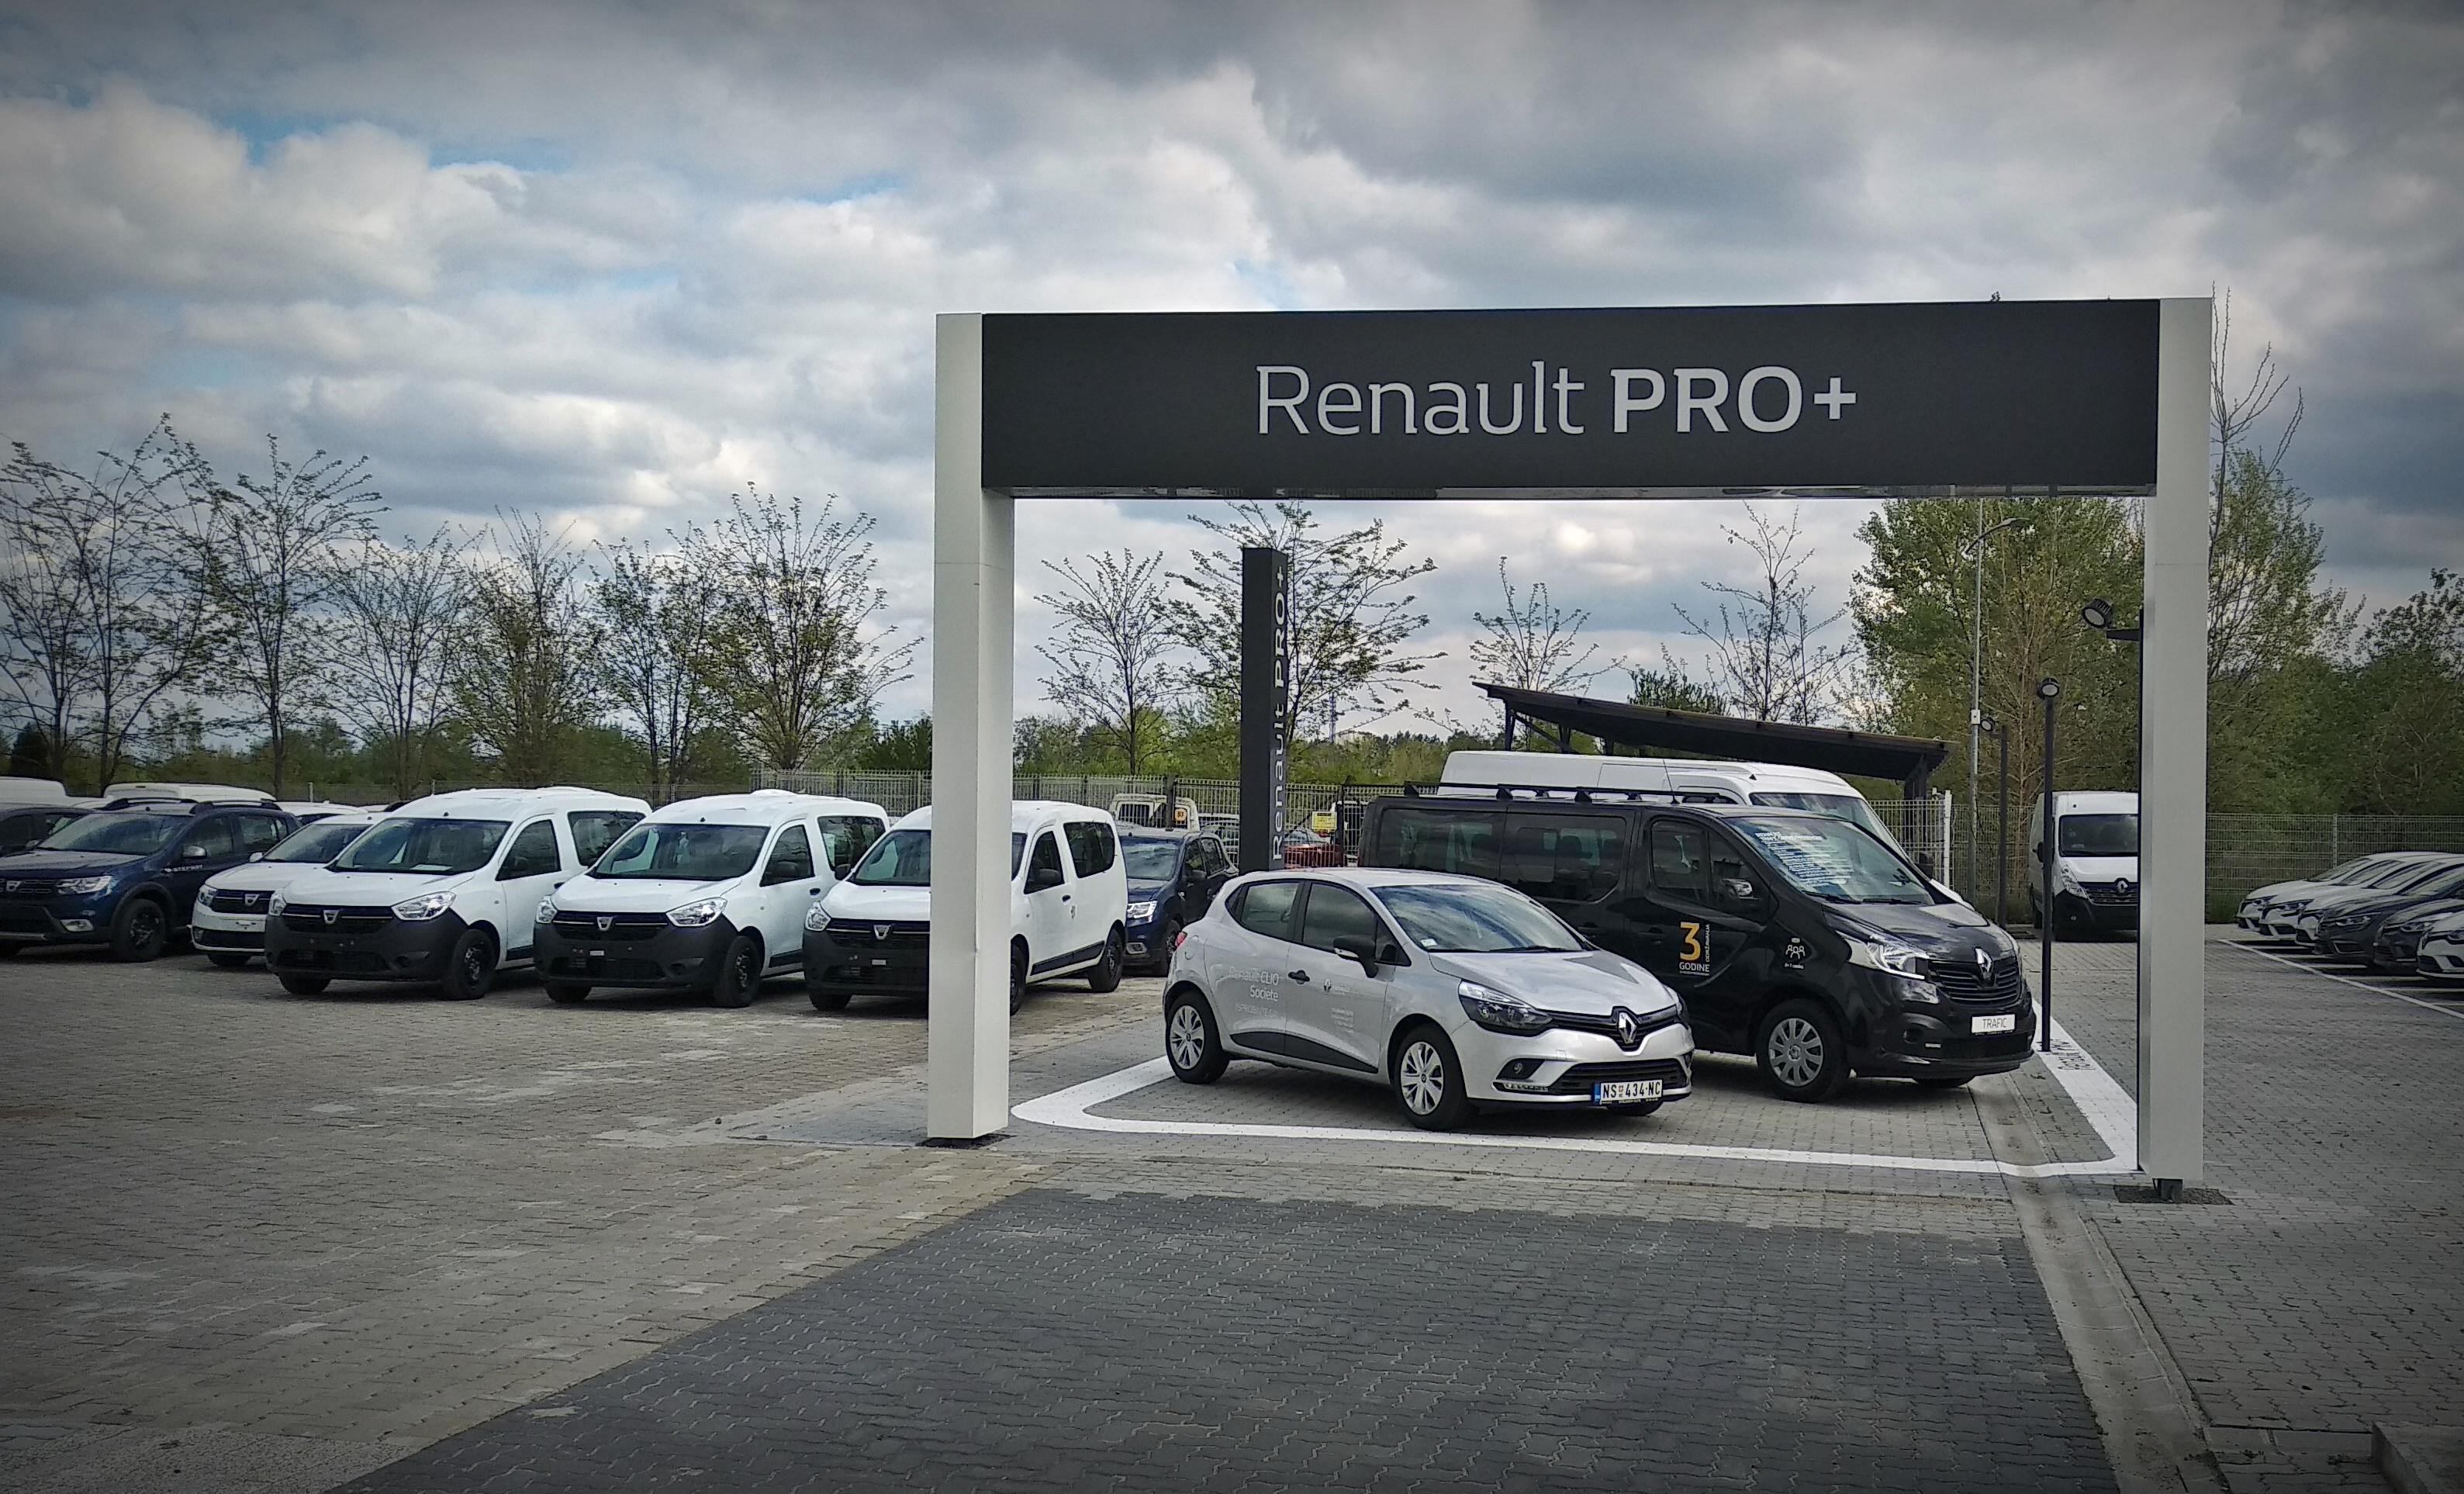 Renault Pro+ i Renault Selection centar otvoreni u Novom Sadu